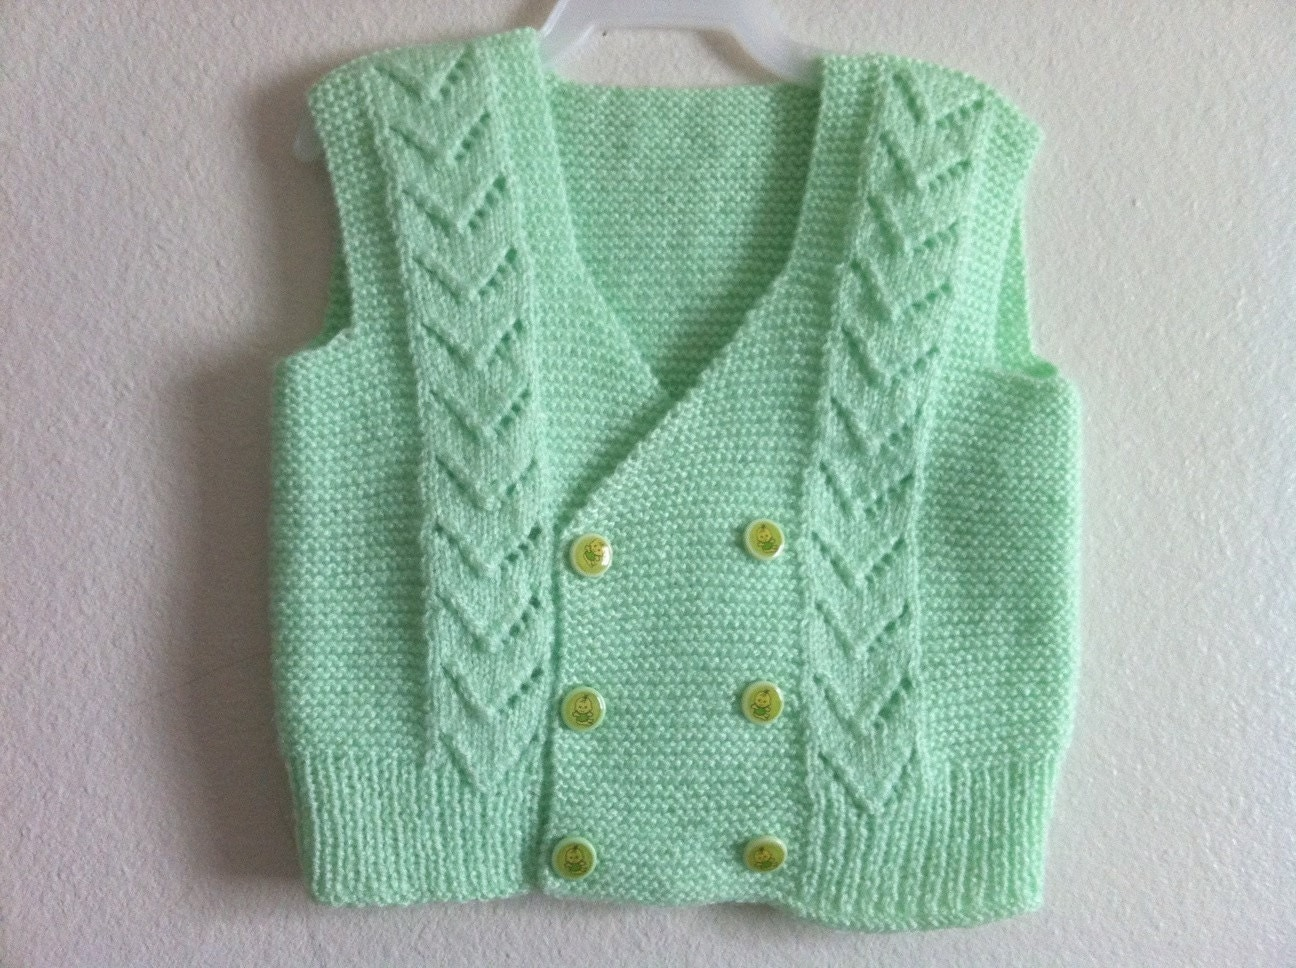 Knitting Pattern Baby Undershirt : Knitting Baby Vest Bolero Knitting Baby Vest by zahraknitting